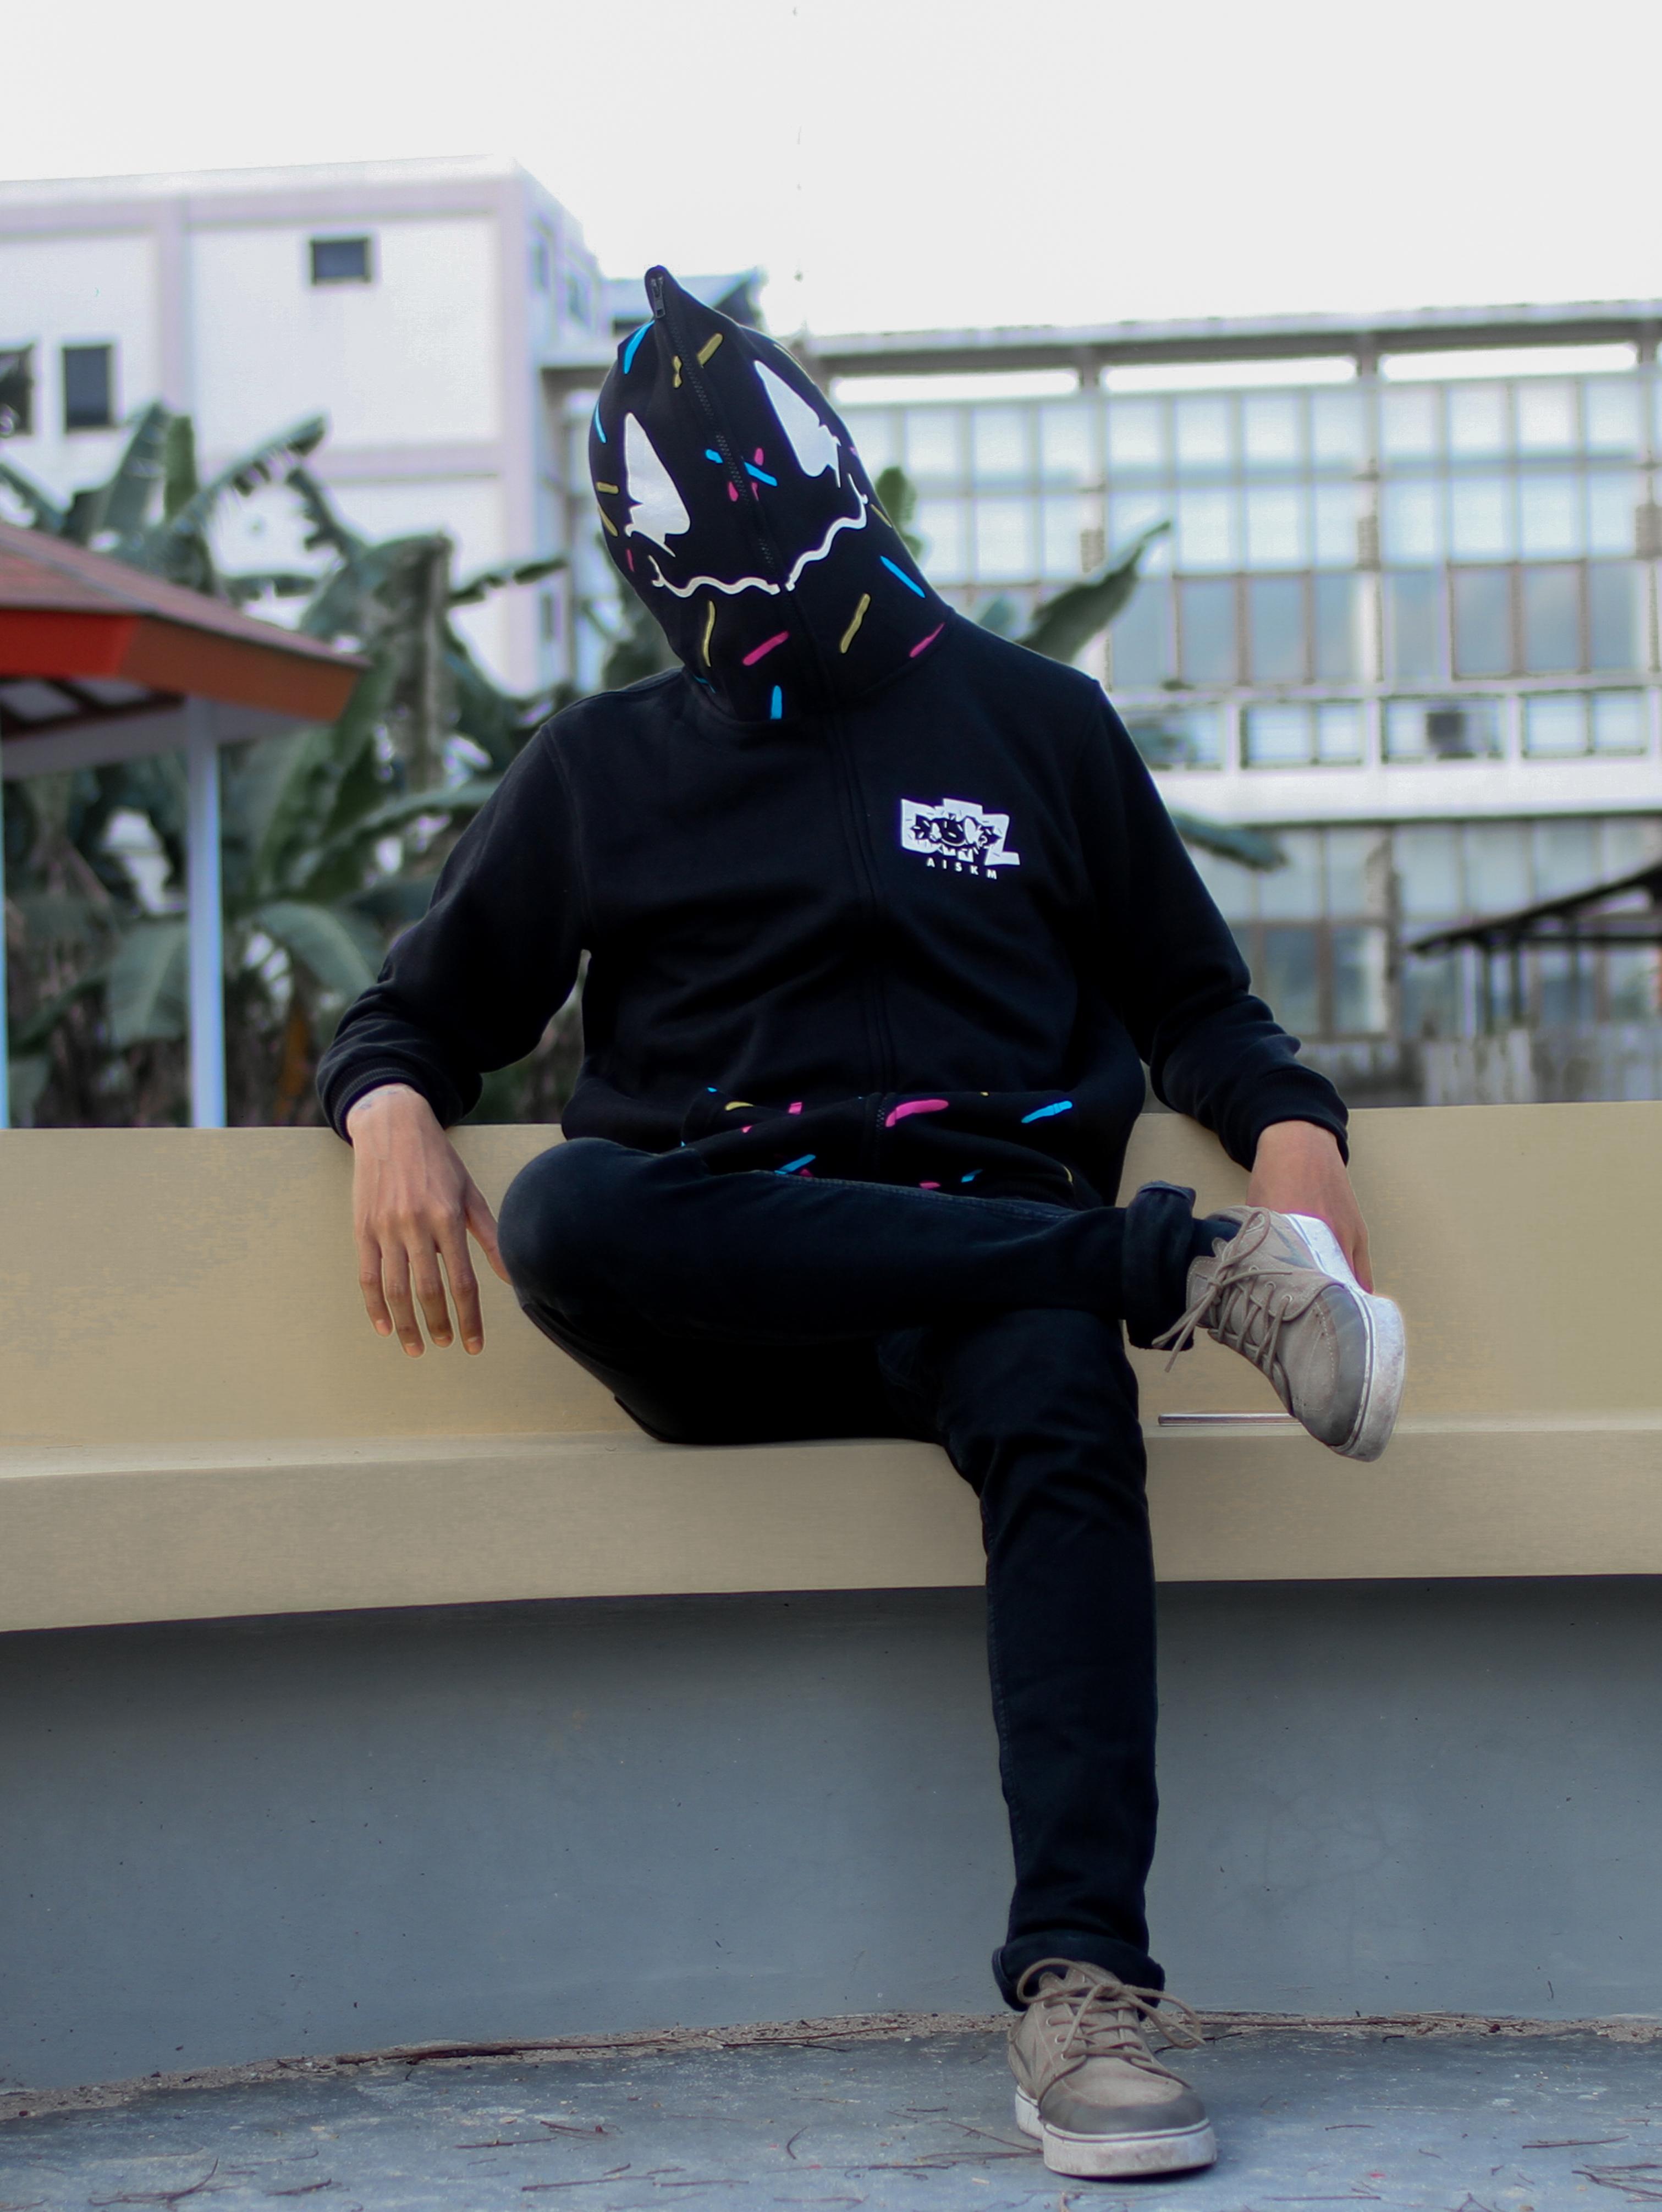 DITZ BRND INDONESIA -  Jual Kaos Distro Brand Lokal Indonesia